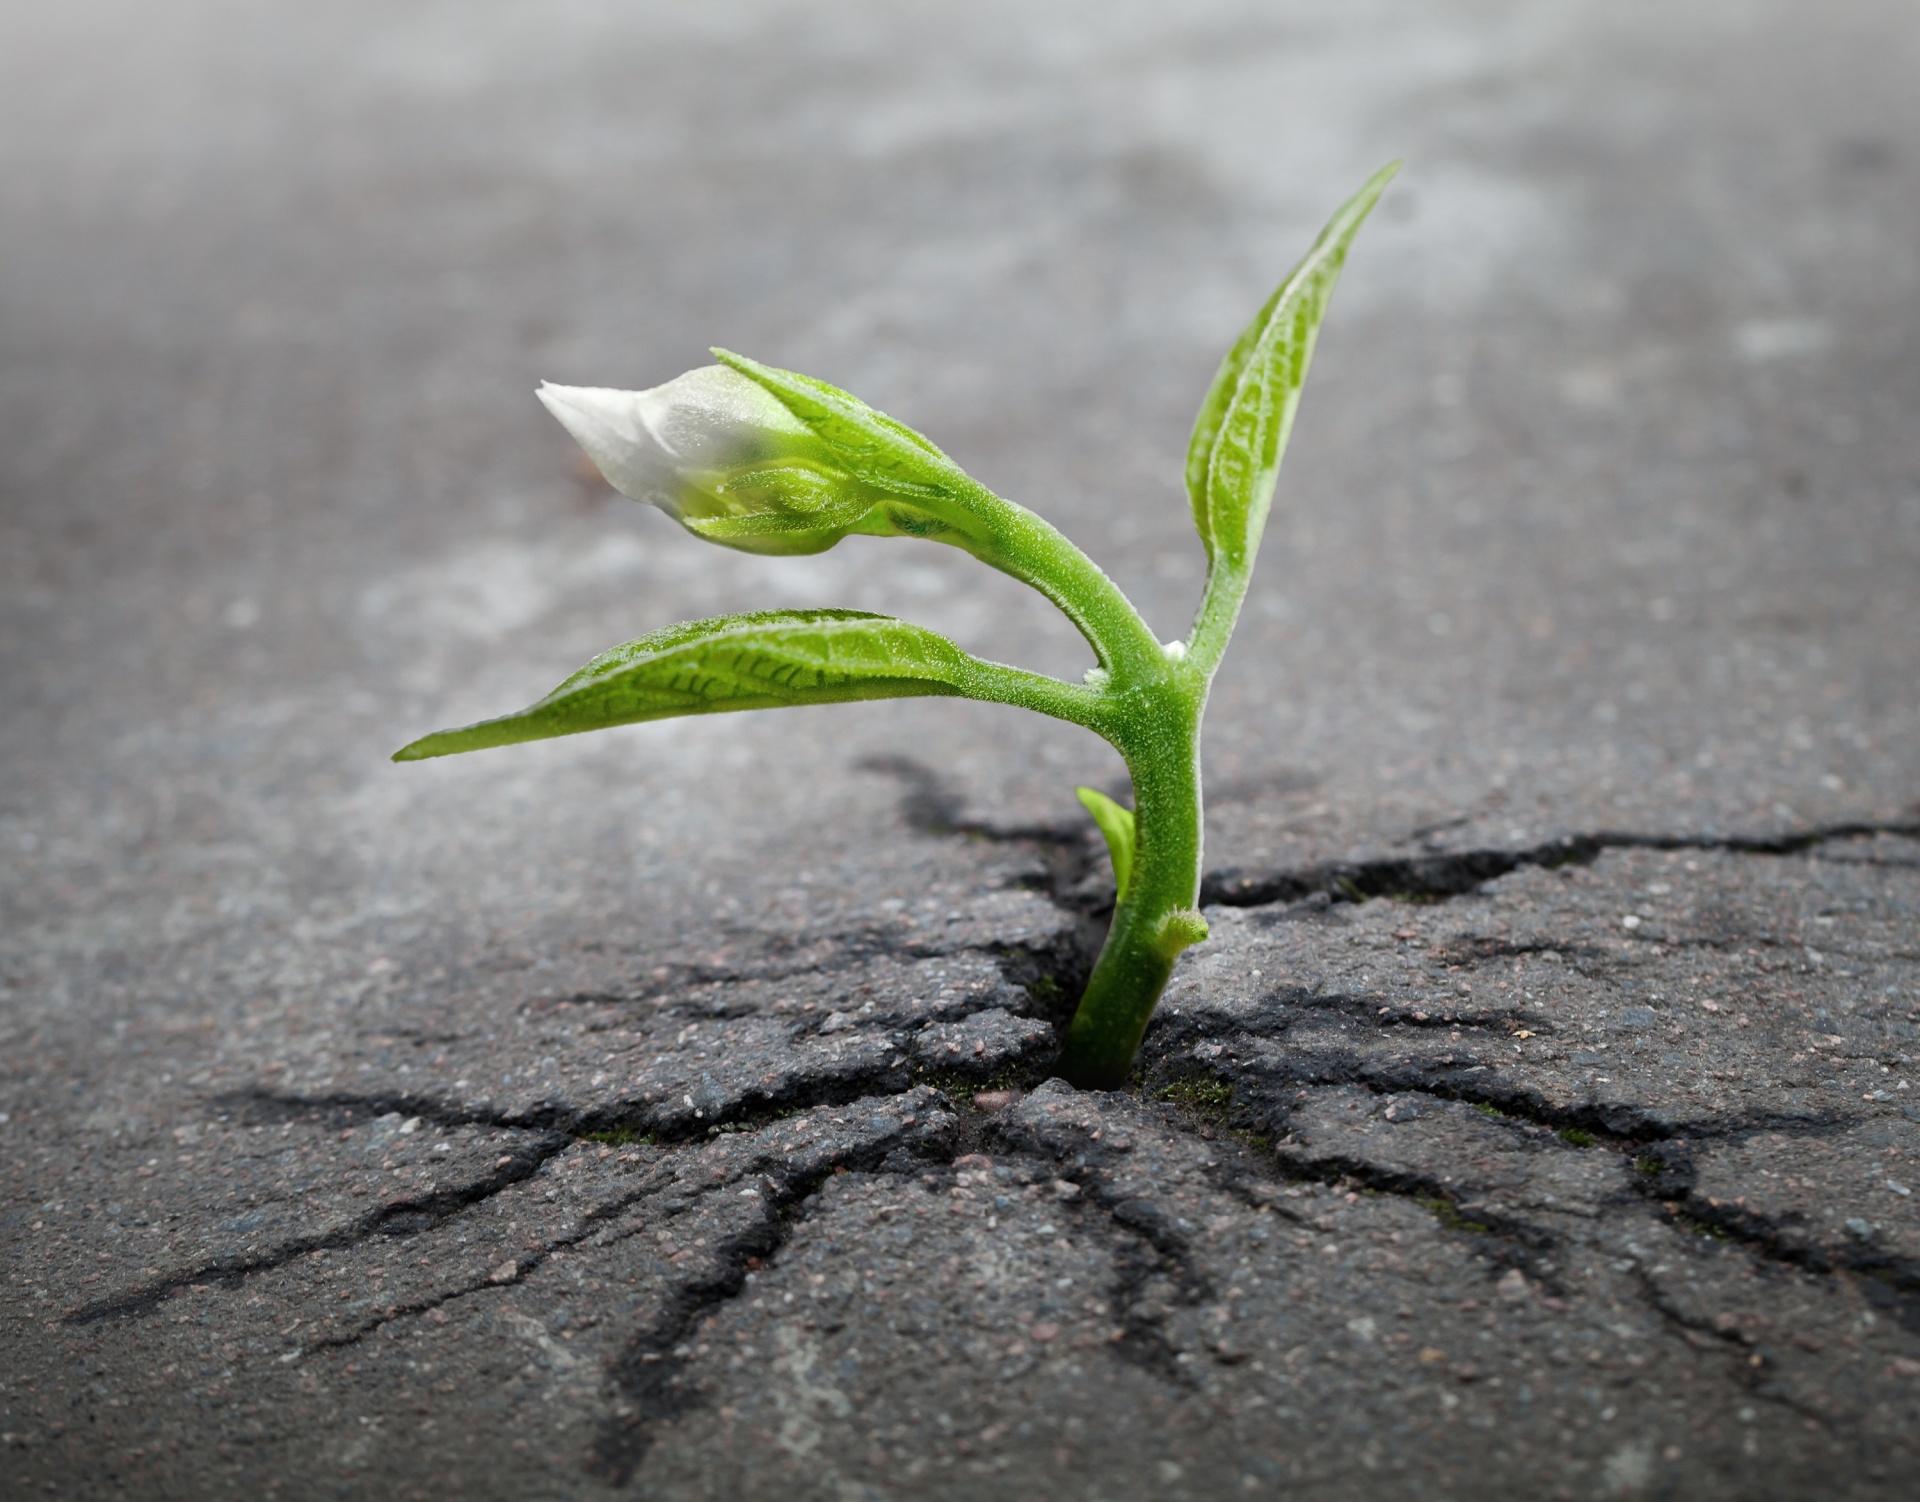 Potential, Growing, Survival